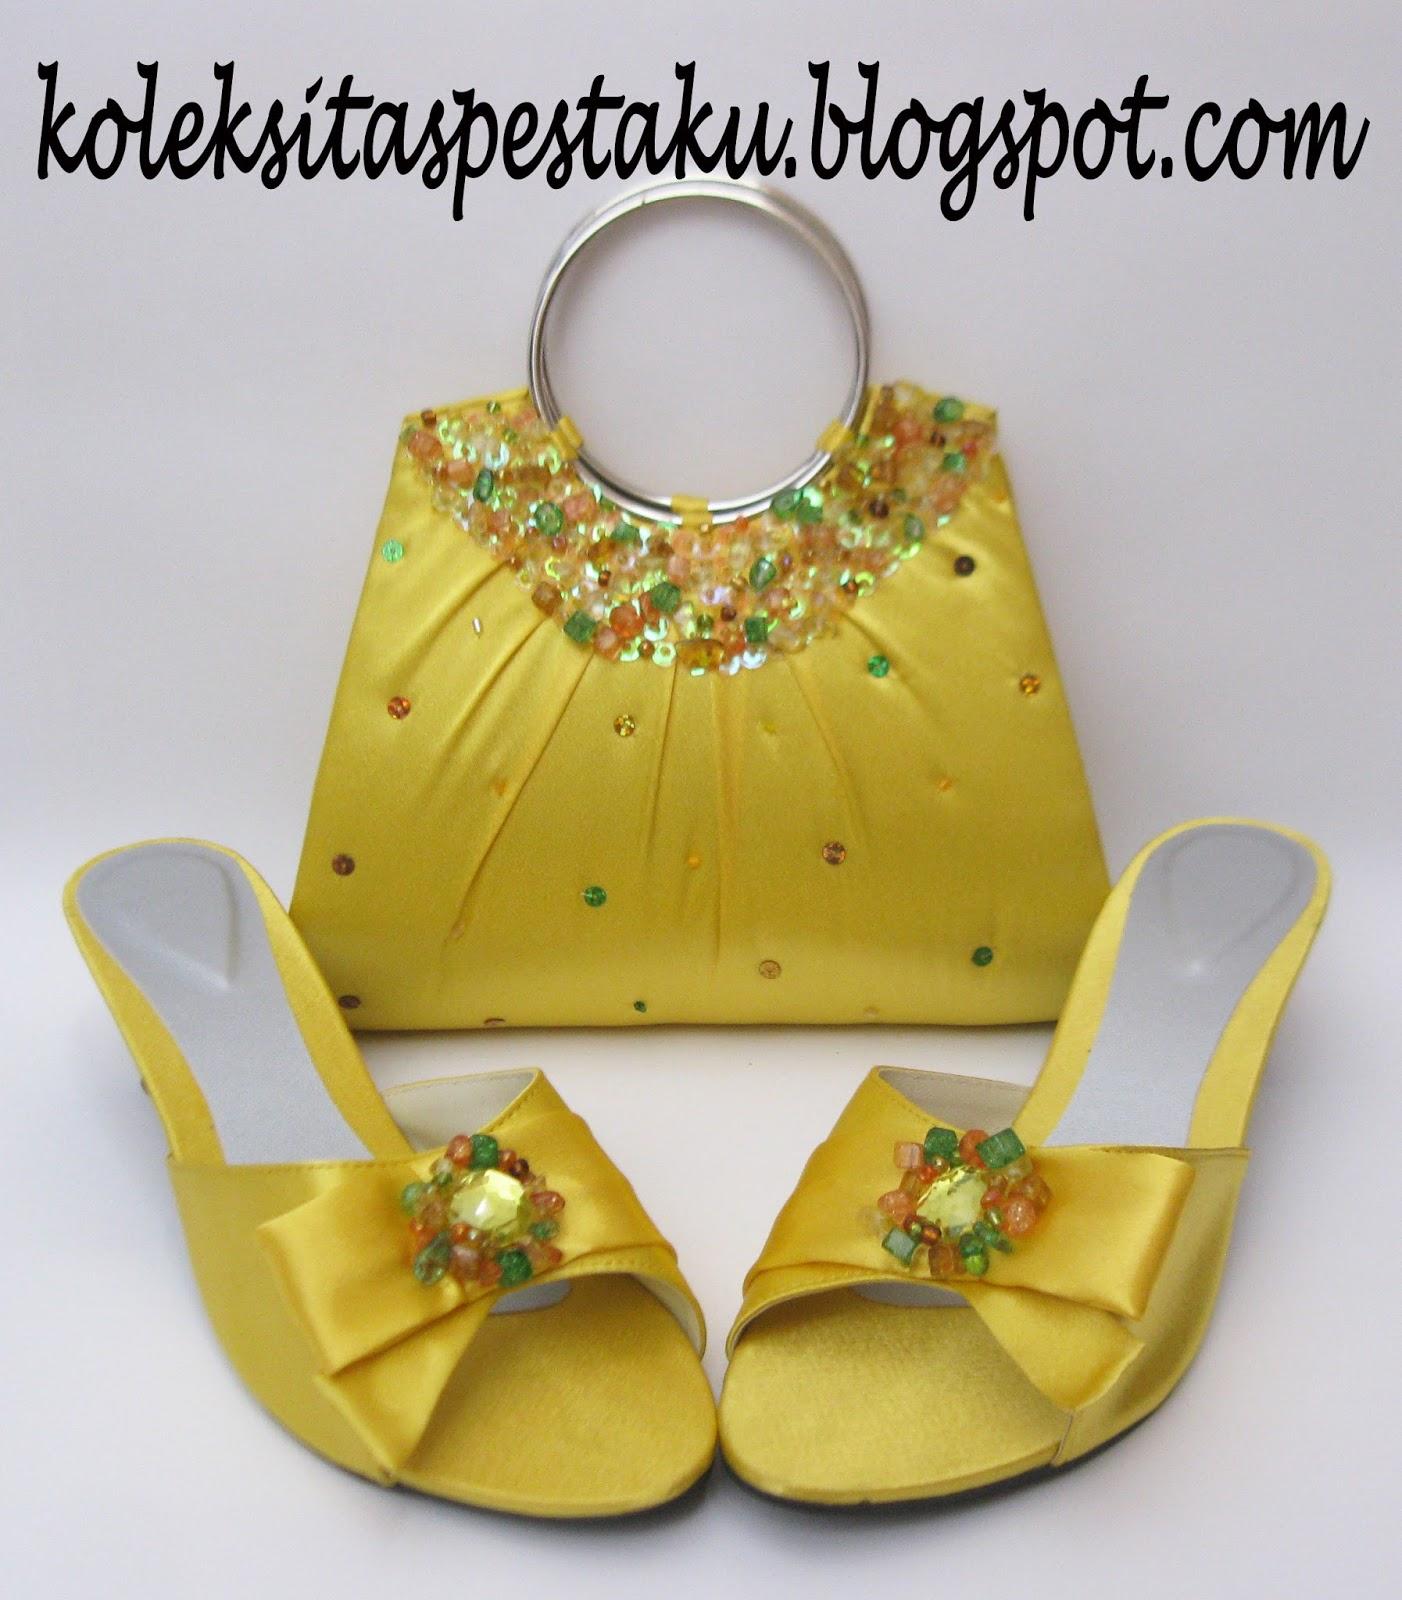 Tas Pesta dan SLop Matching Warna Kuning Mewah. Tas Pesta - Clutch Bag ... 505a1b26d1